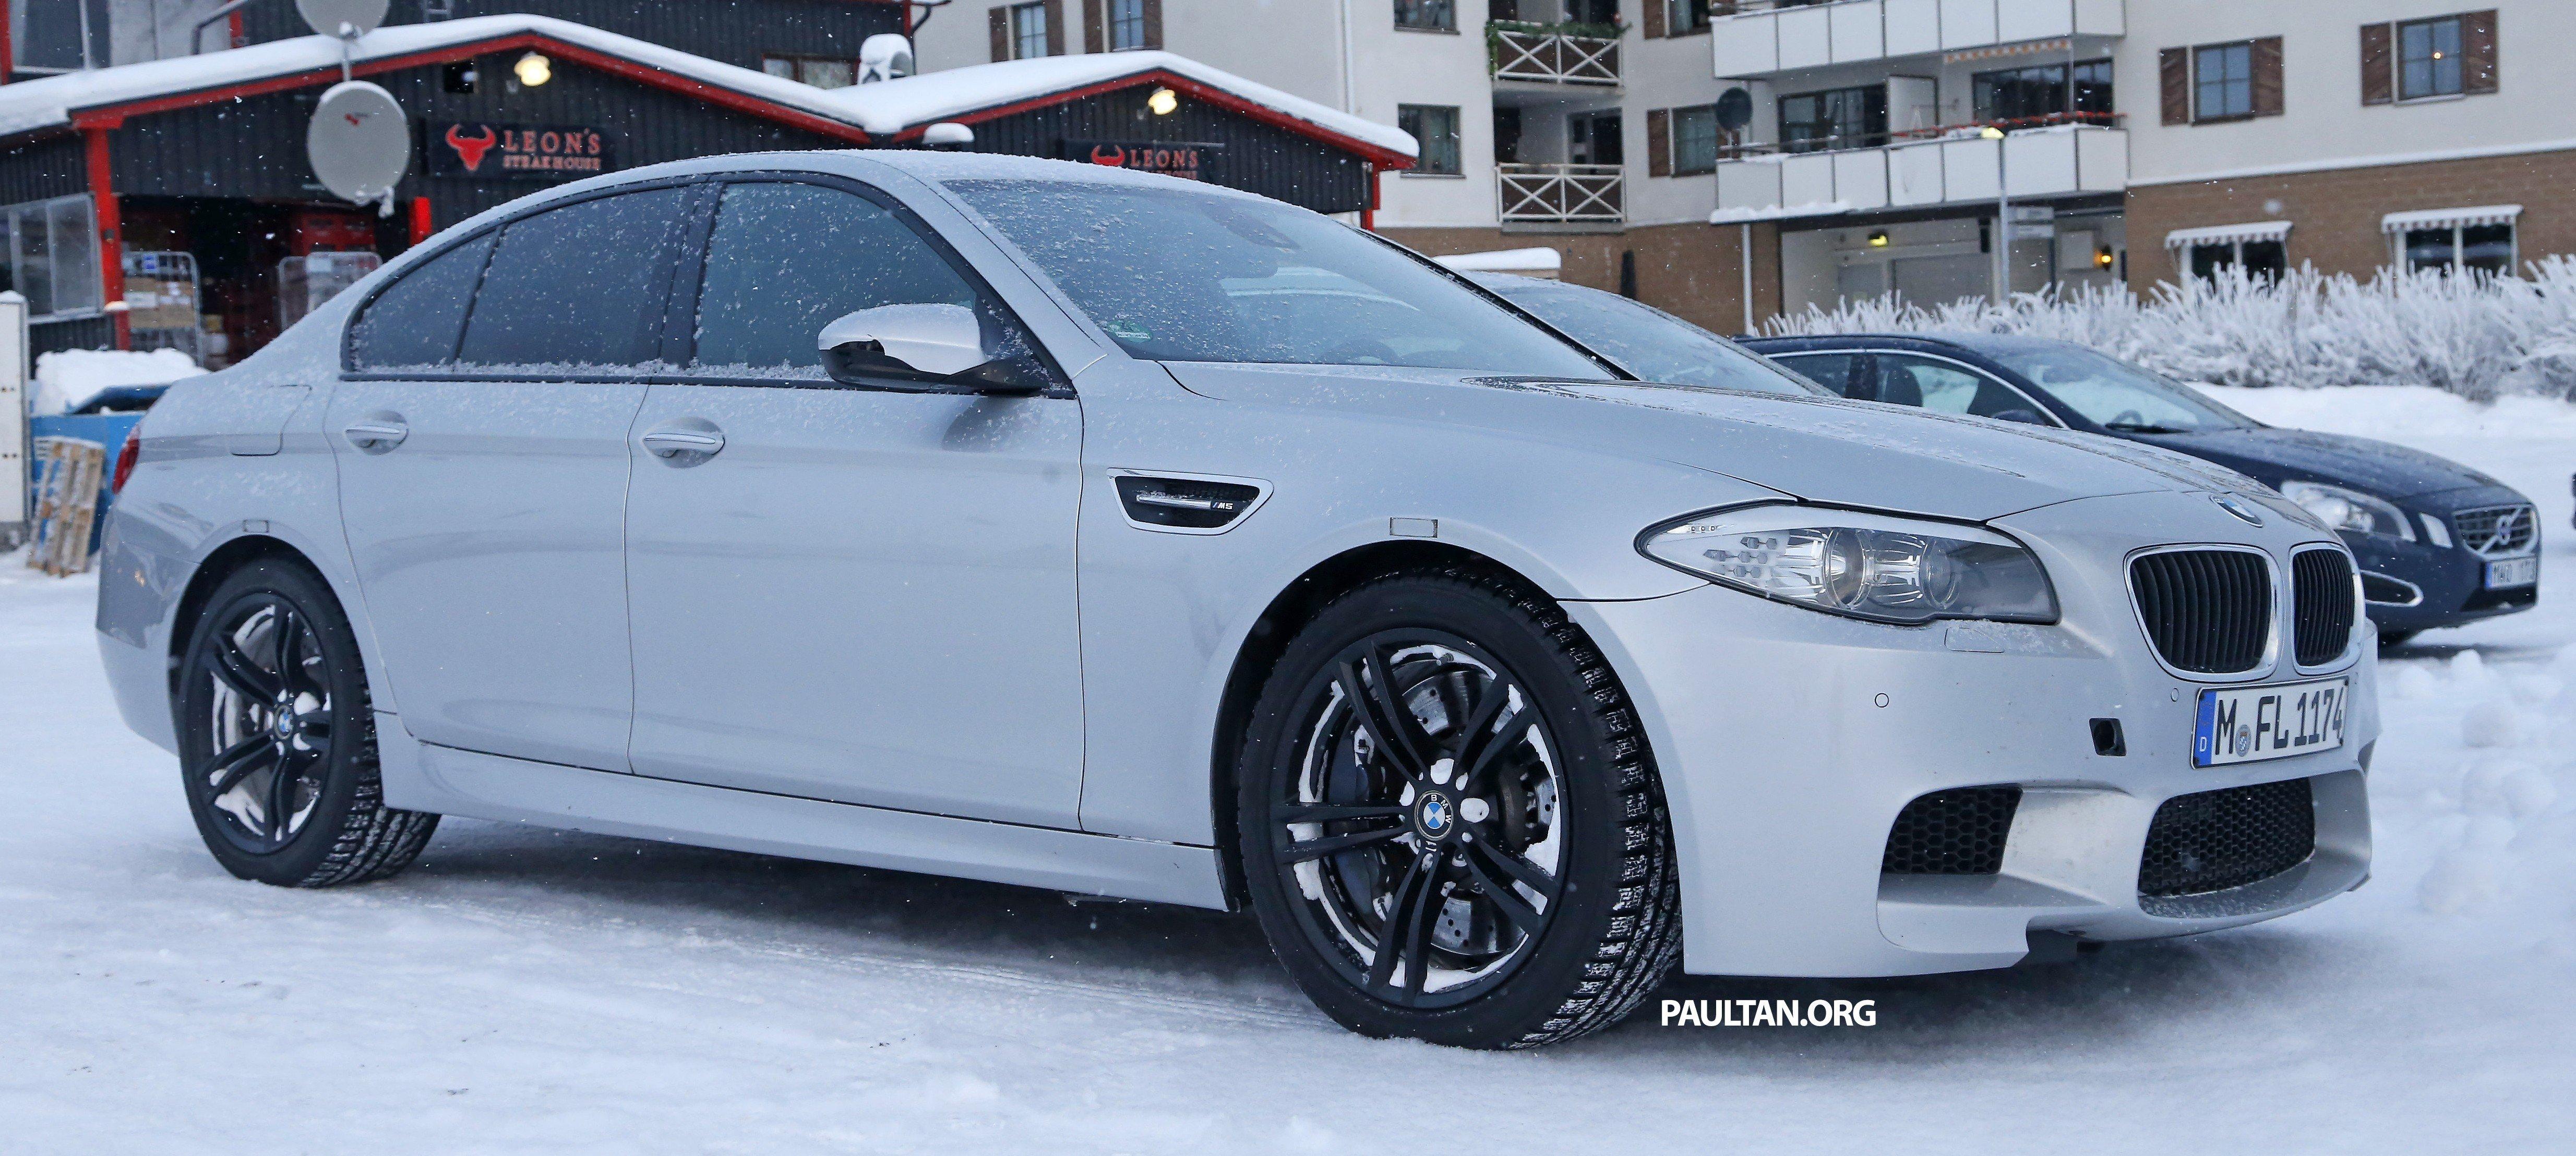 SPIED: BMW M5 xDrive prototype becomes reality Paul Tan ...